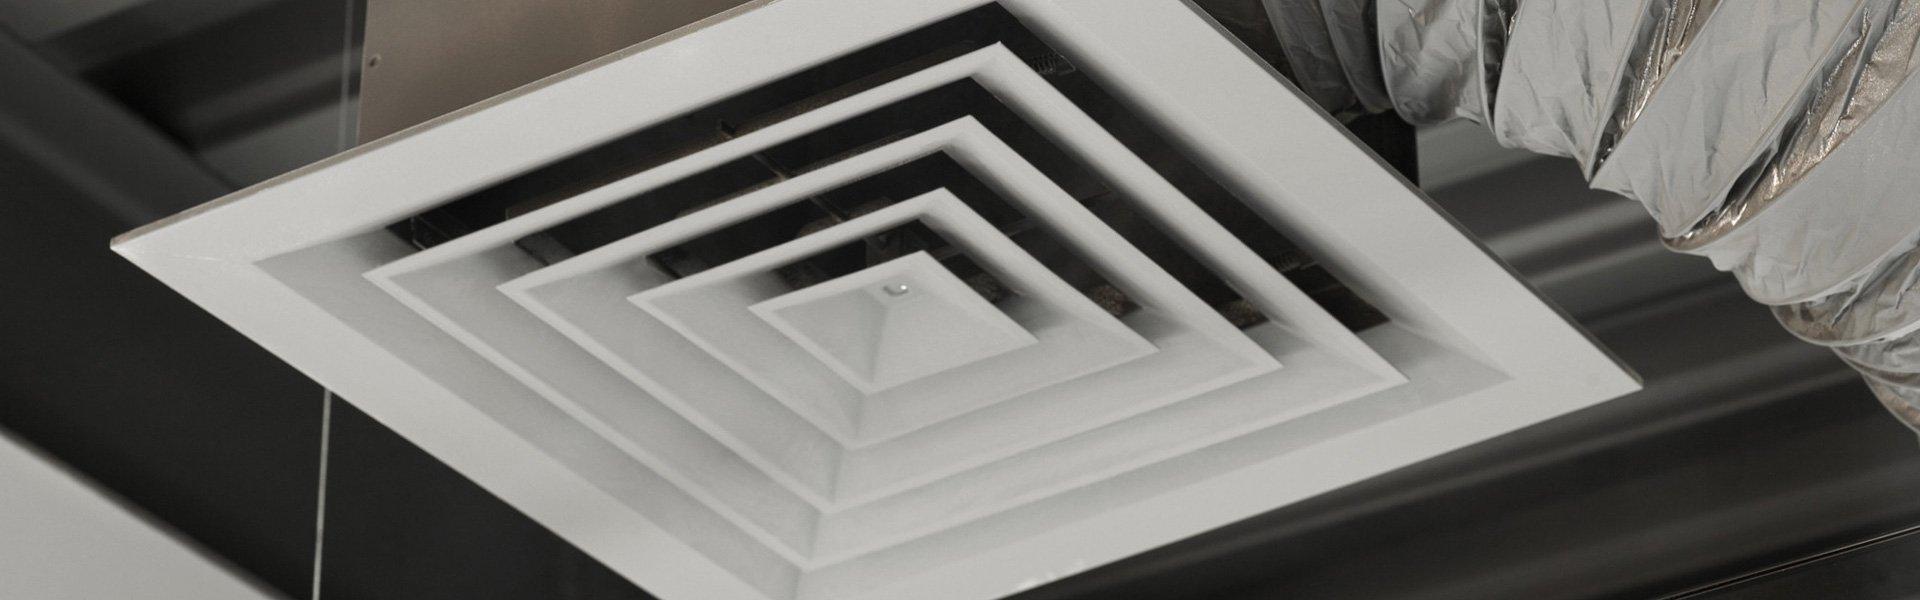 small ac ventilation